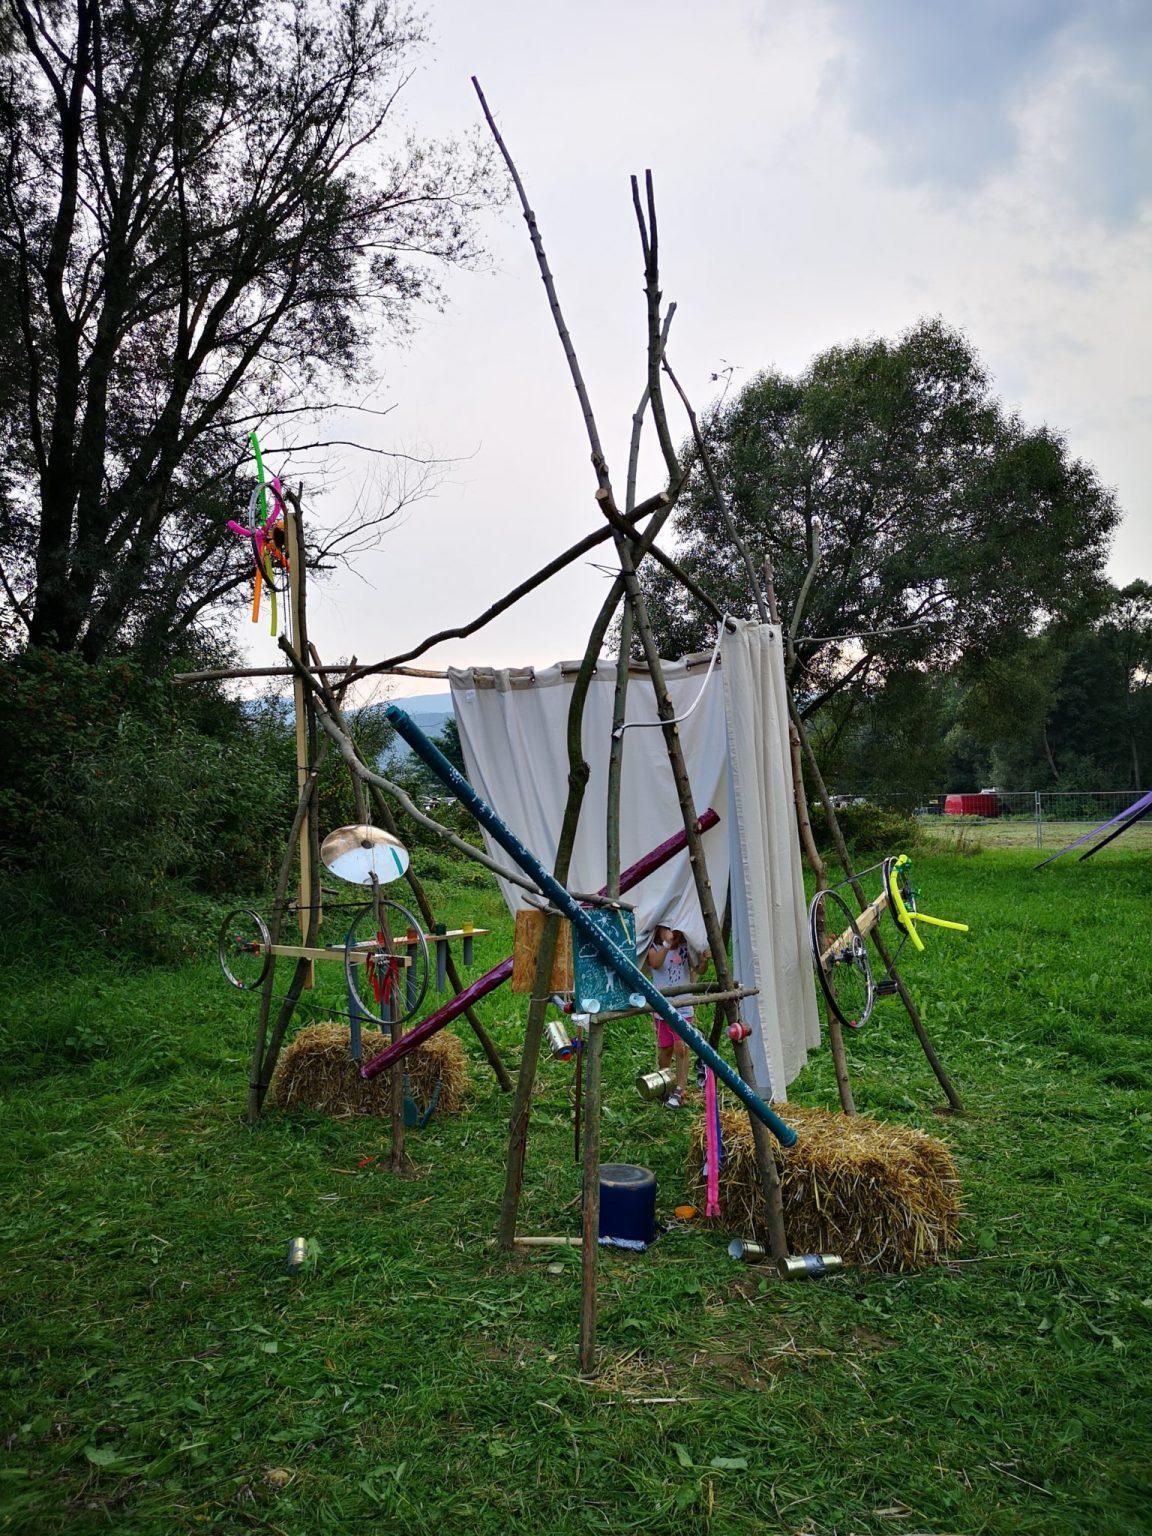 machina festiwal pannonica dla dzieci